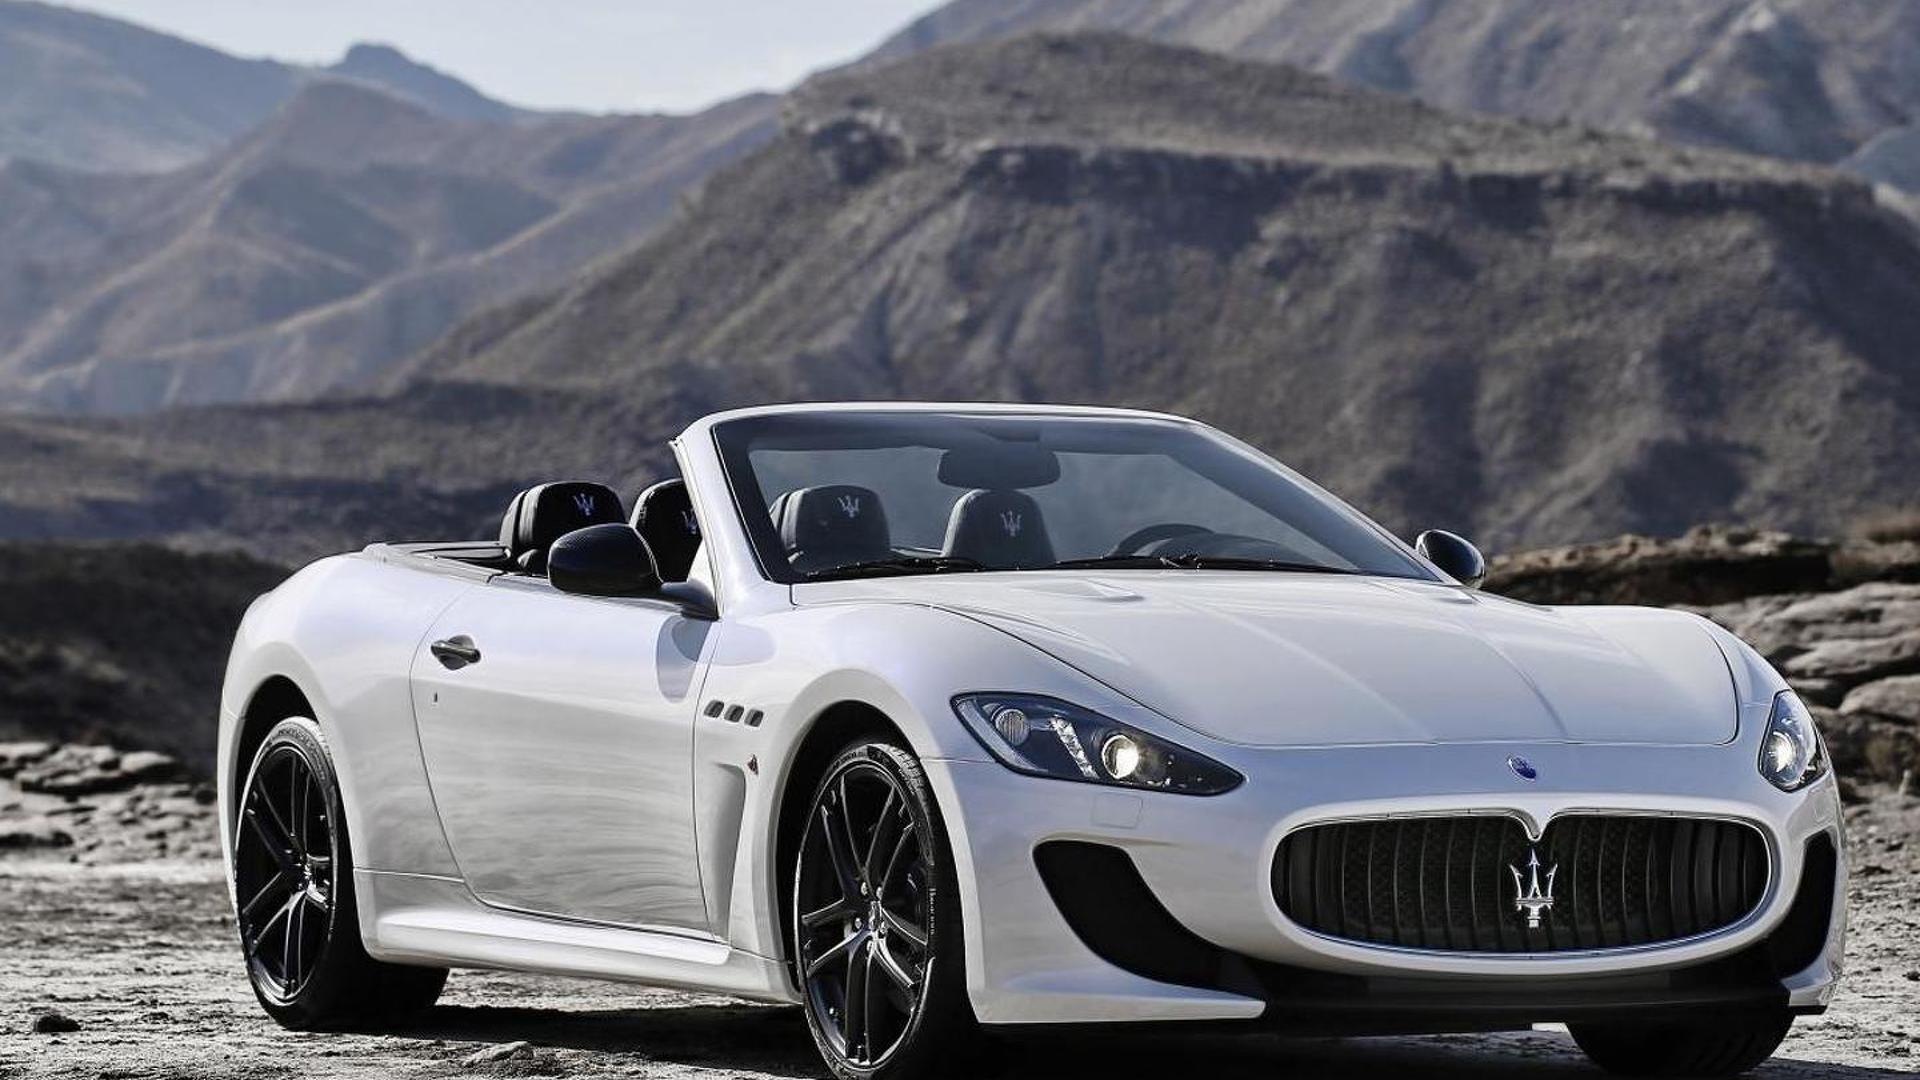 OFFICIAL: Maserati GranCabrio MC revealed